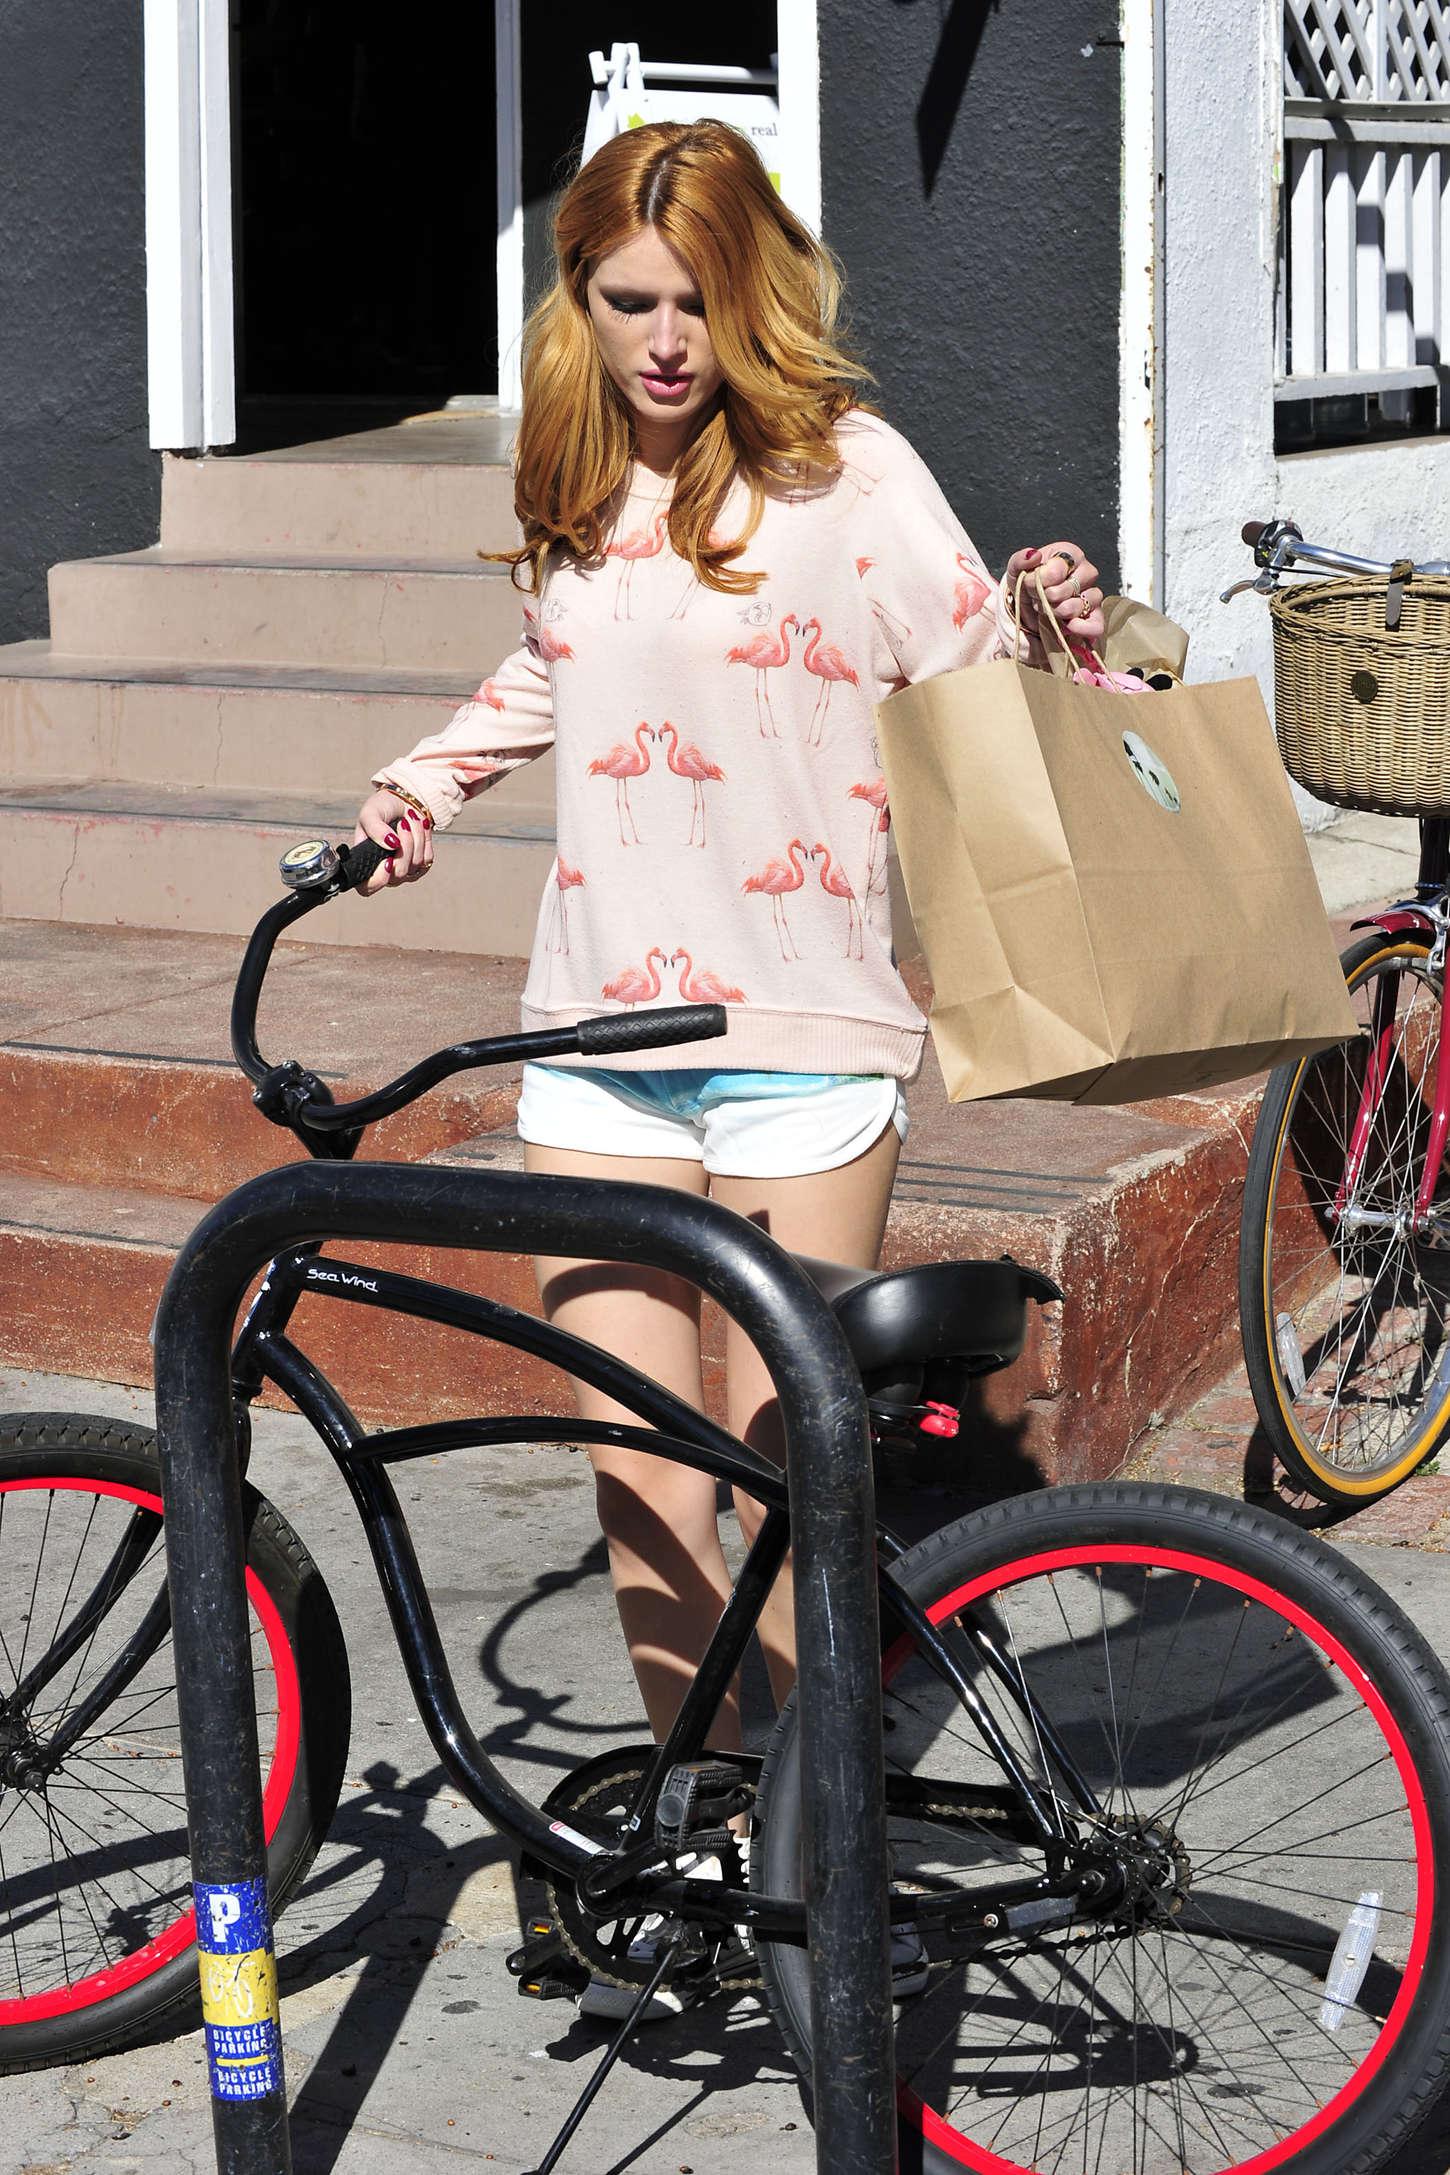 Bella Thorne 2014 : Bella Thorne: Michael Simon Photoshoot 2014 -36